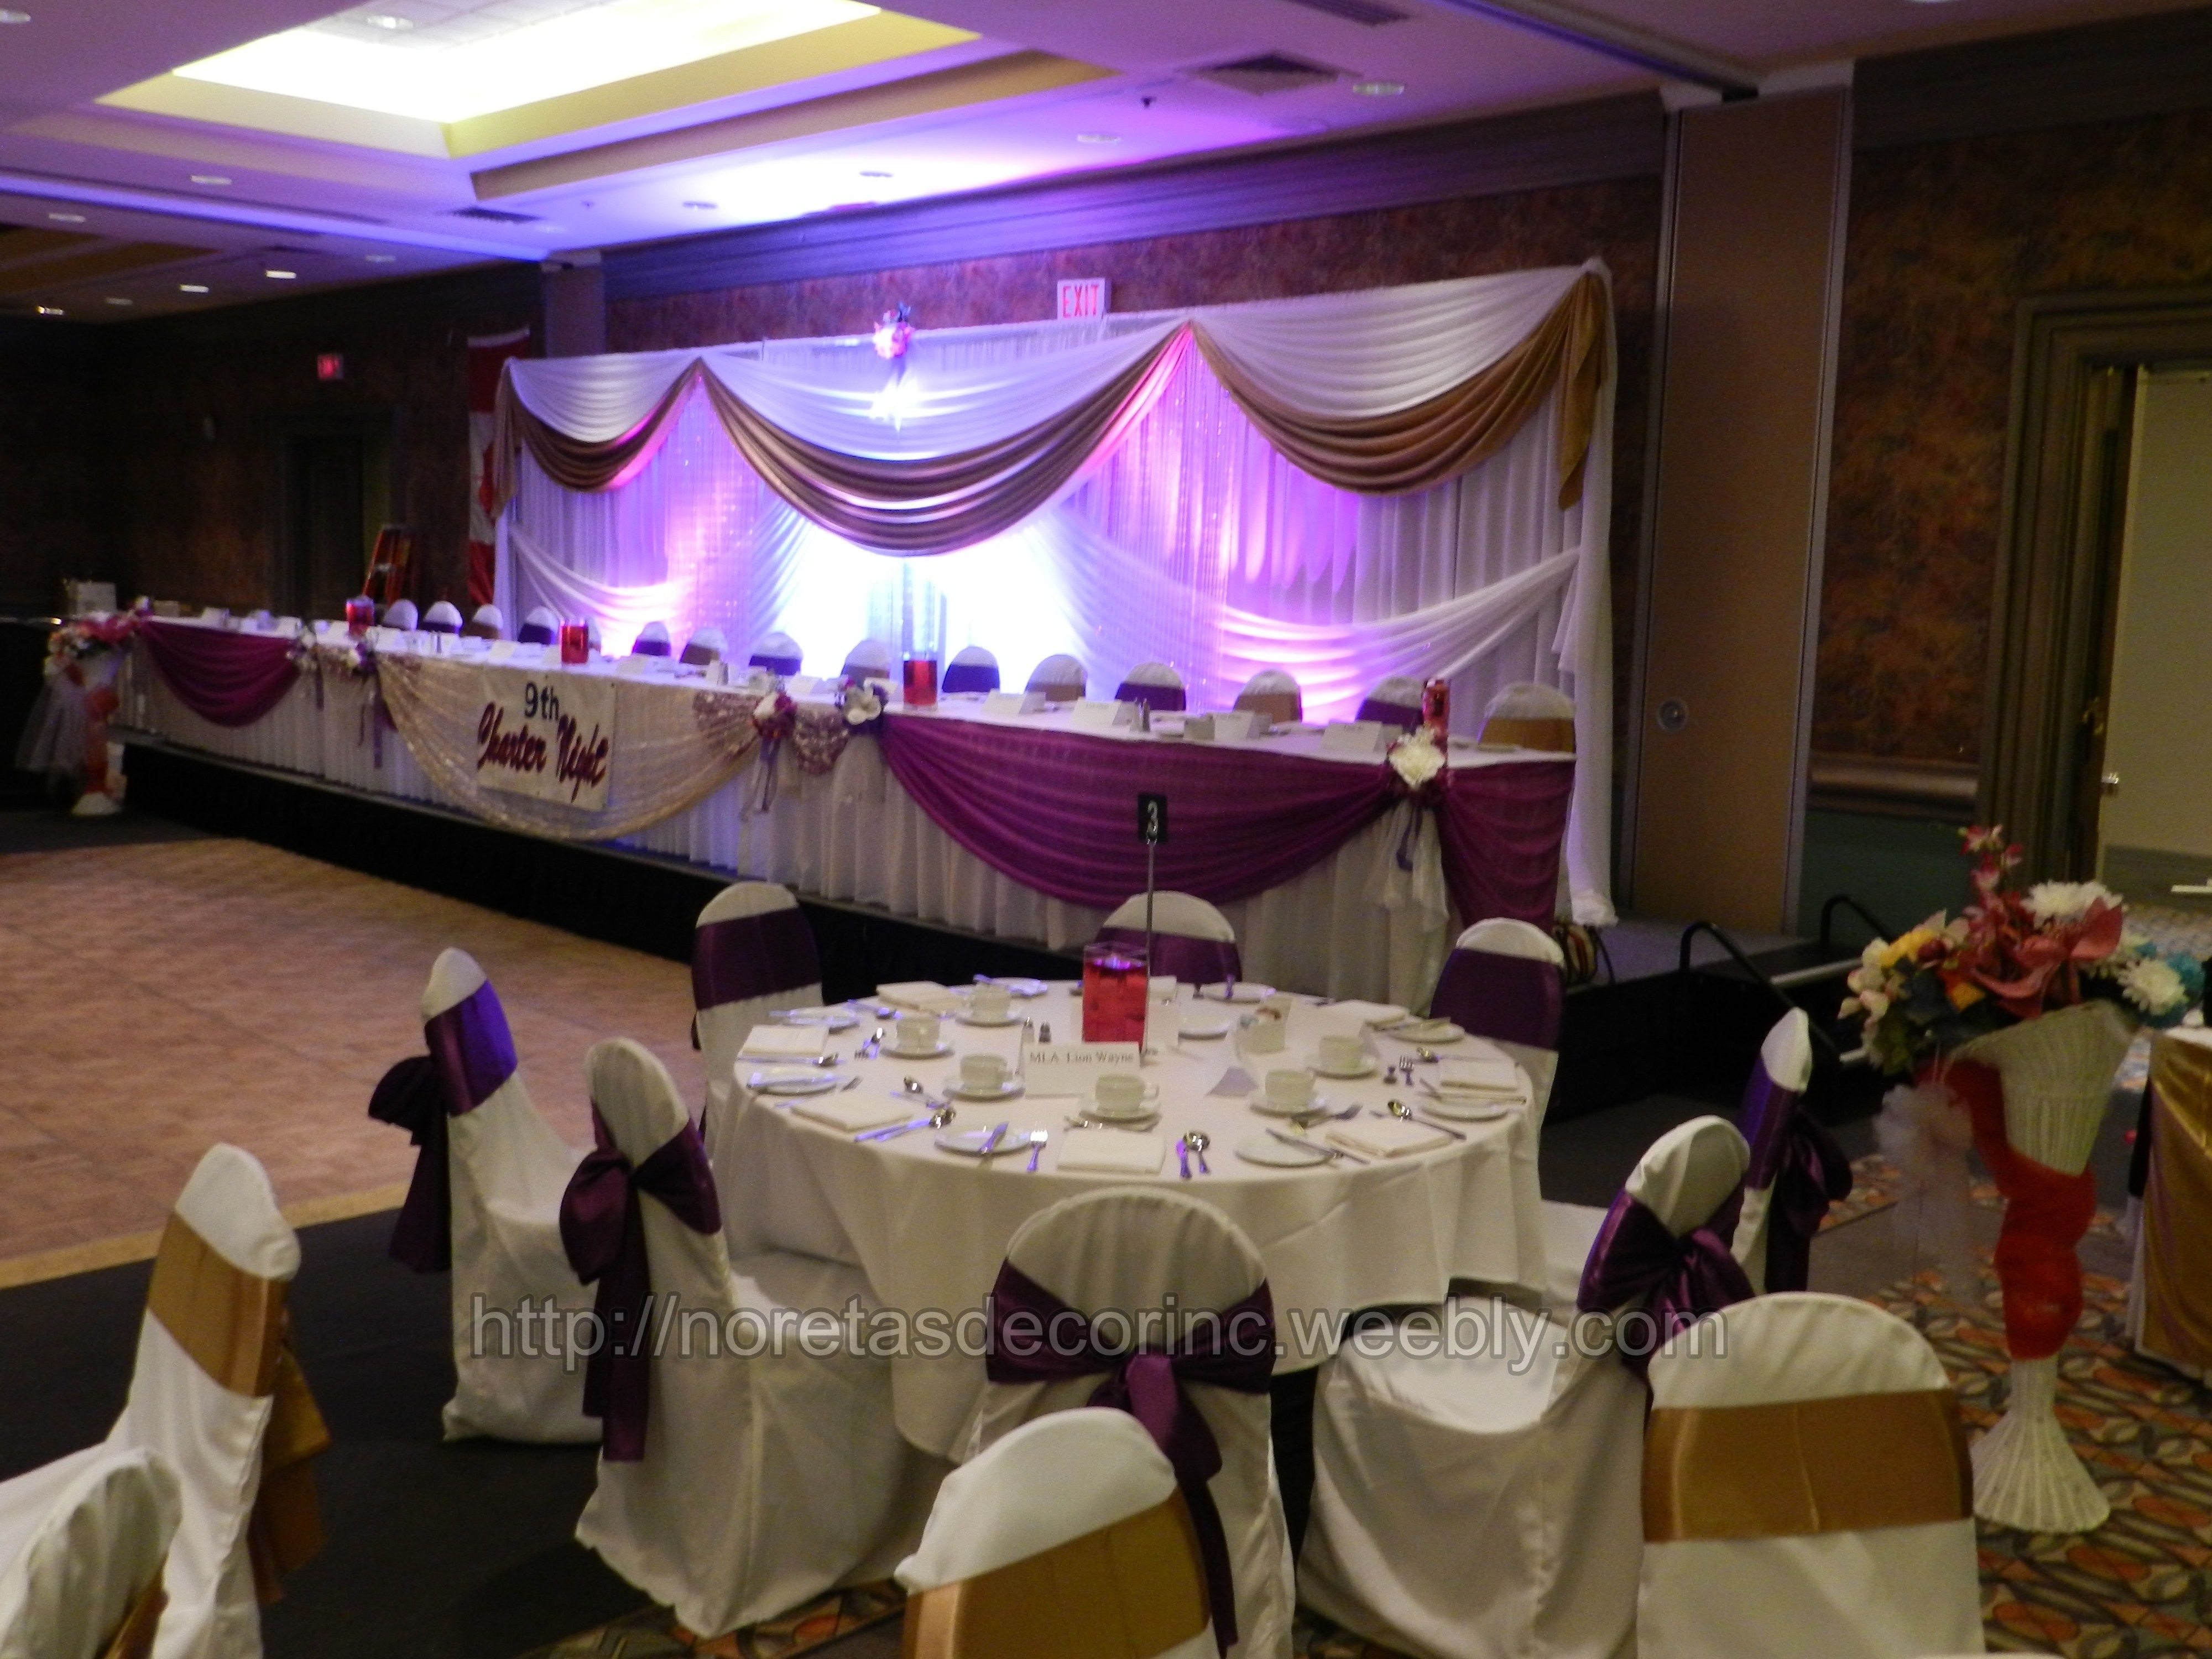 Banquet hall decoration Ideas reception backdrop http